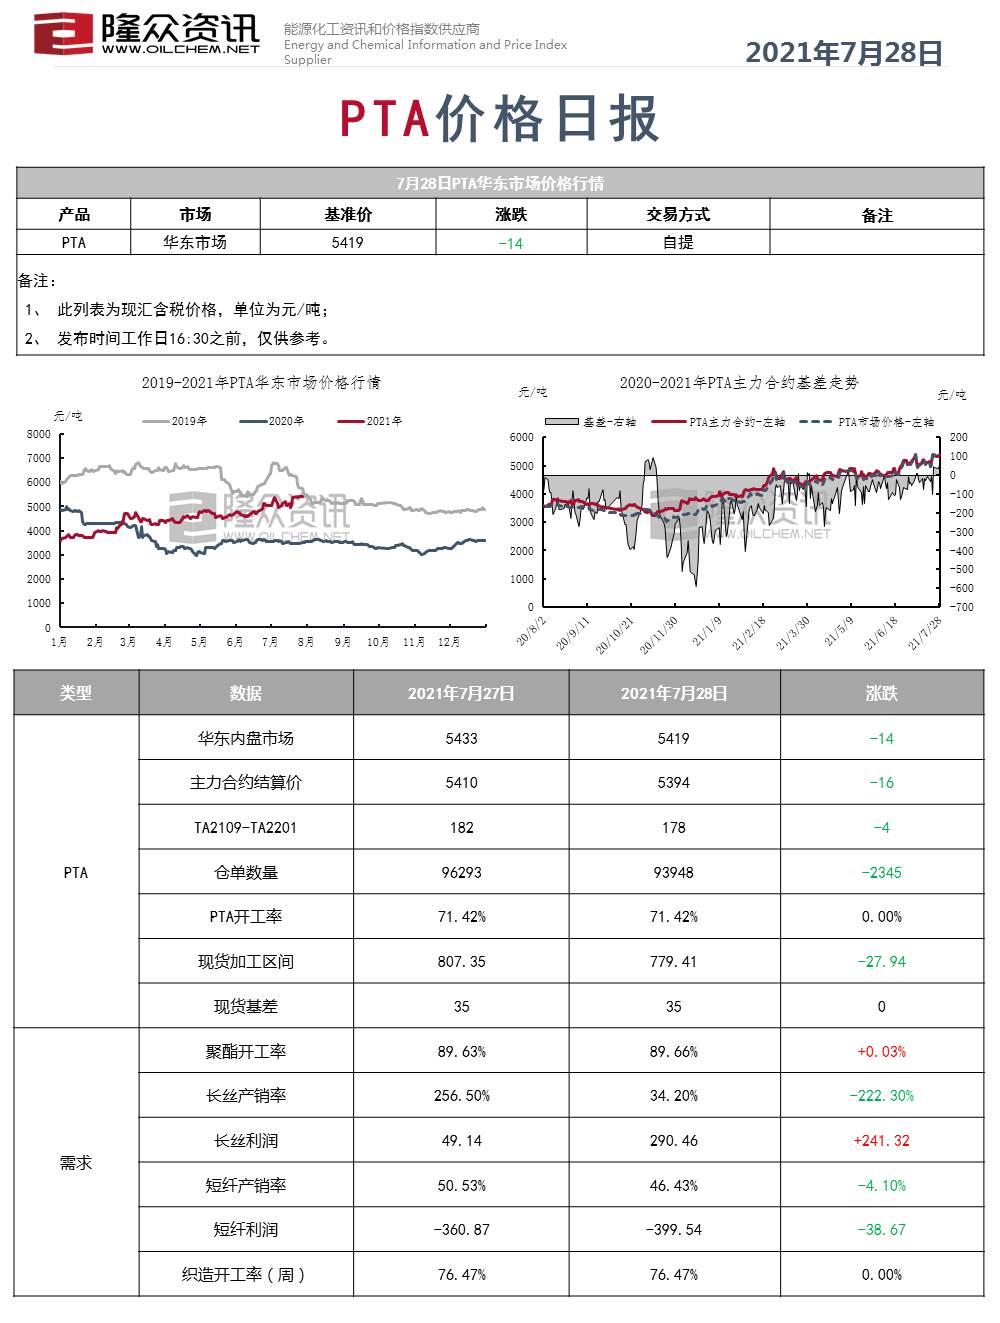 PTA价格日报修改版.jpg